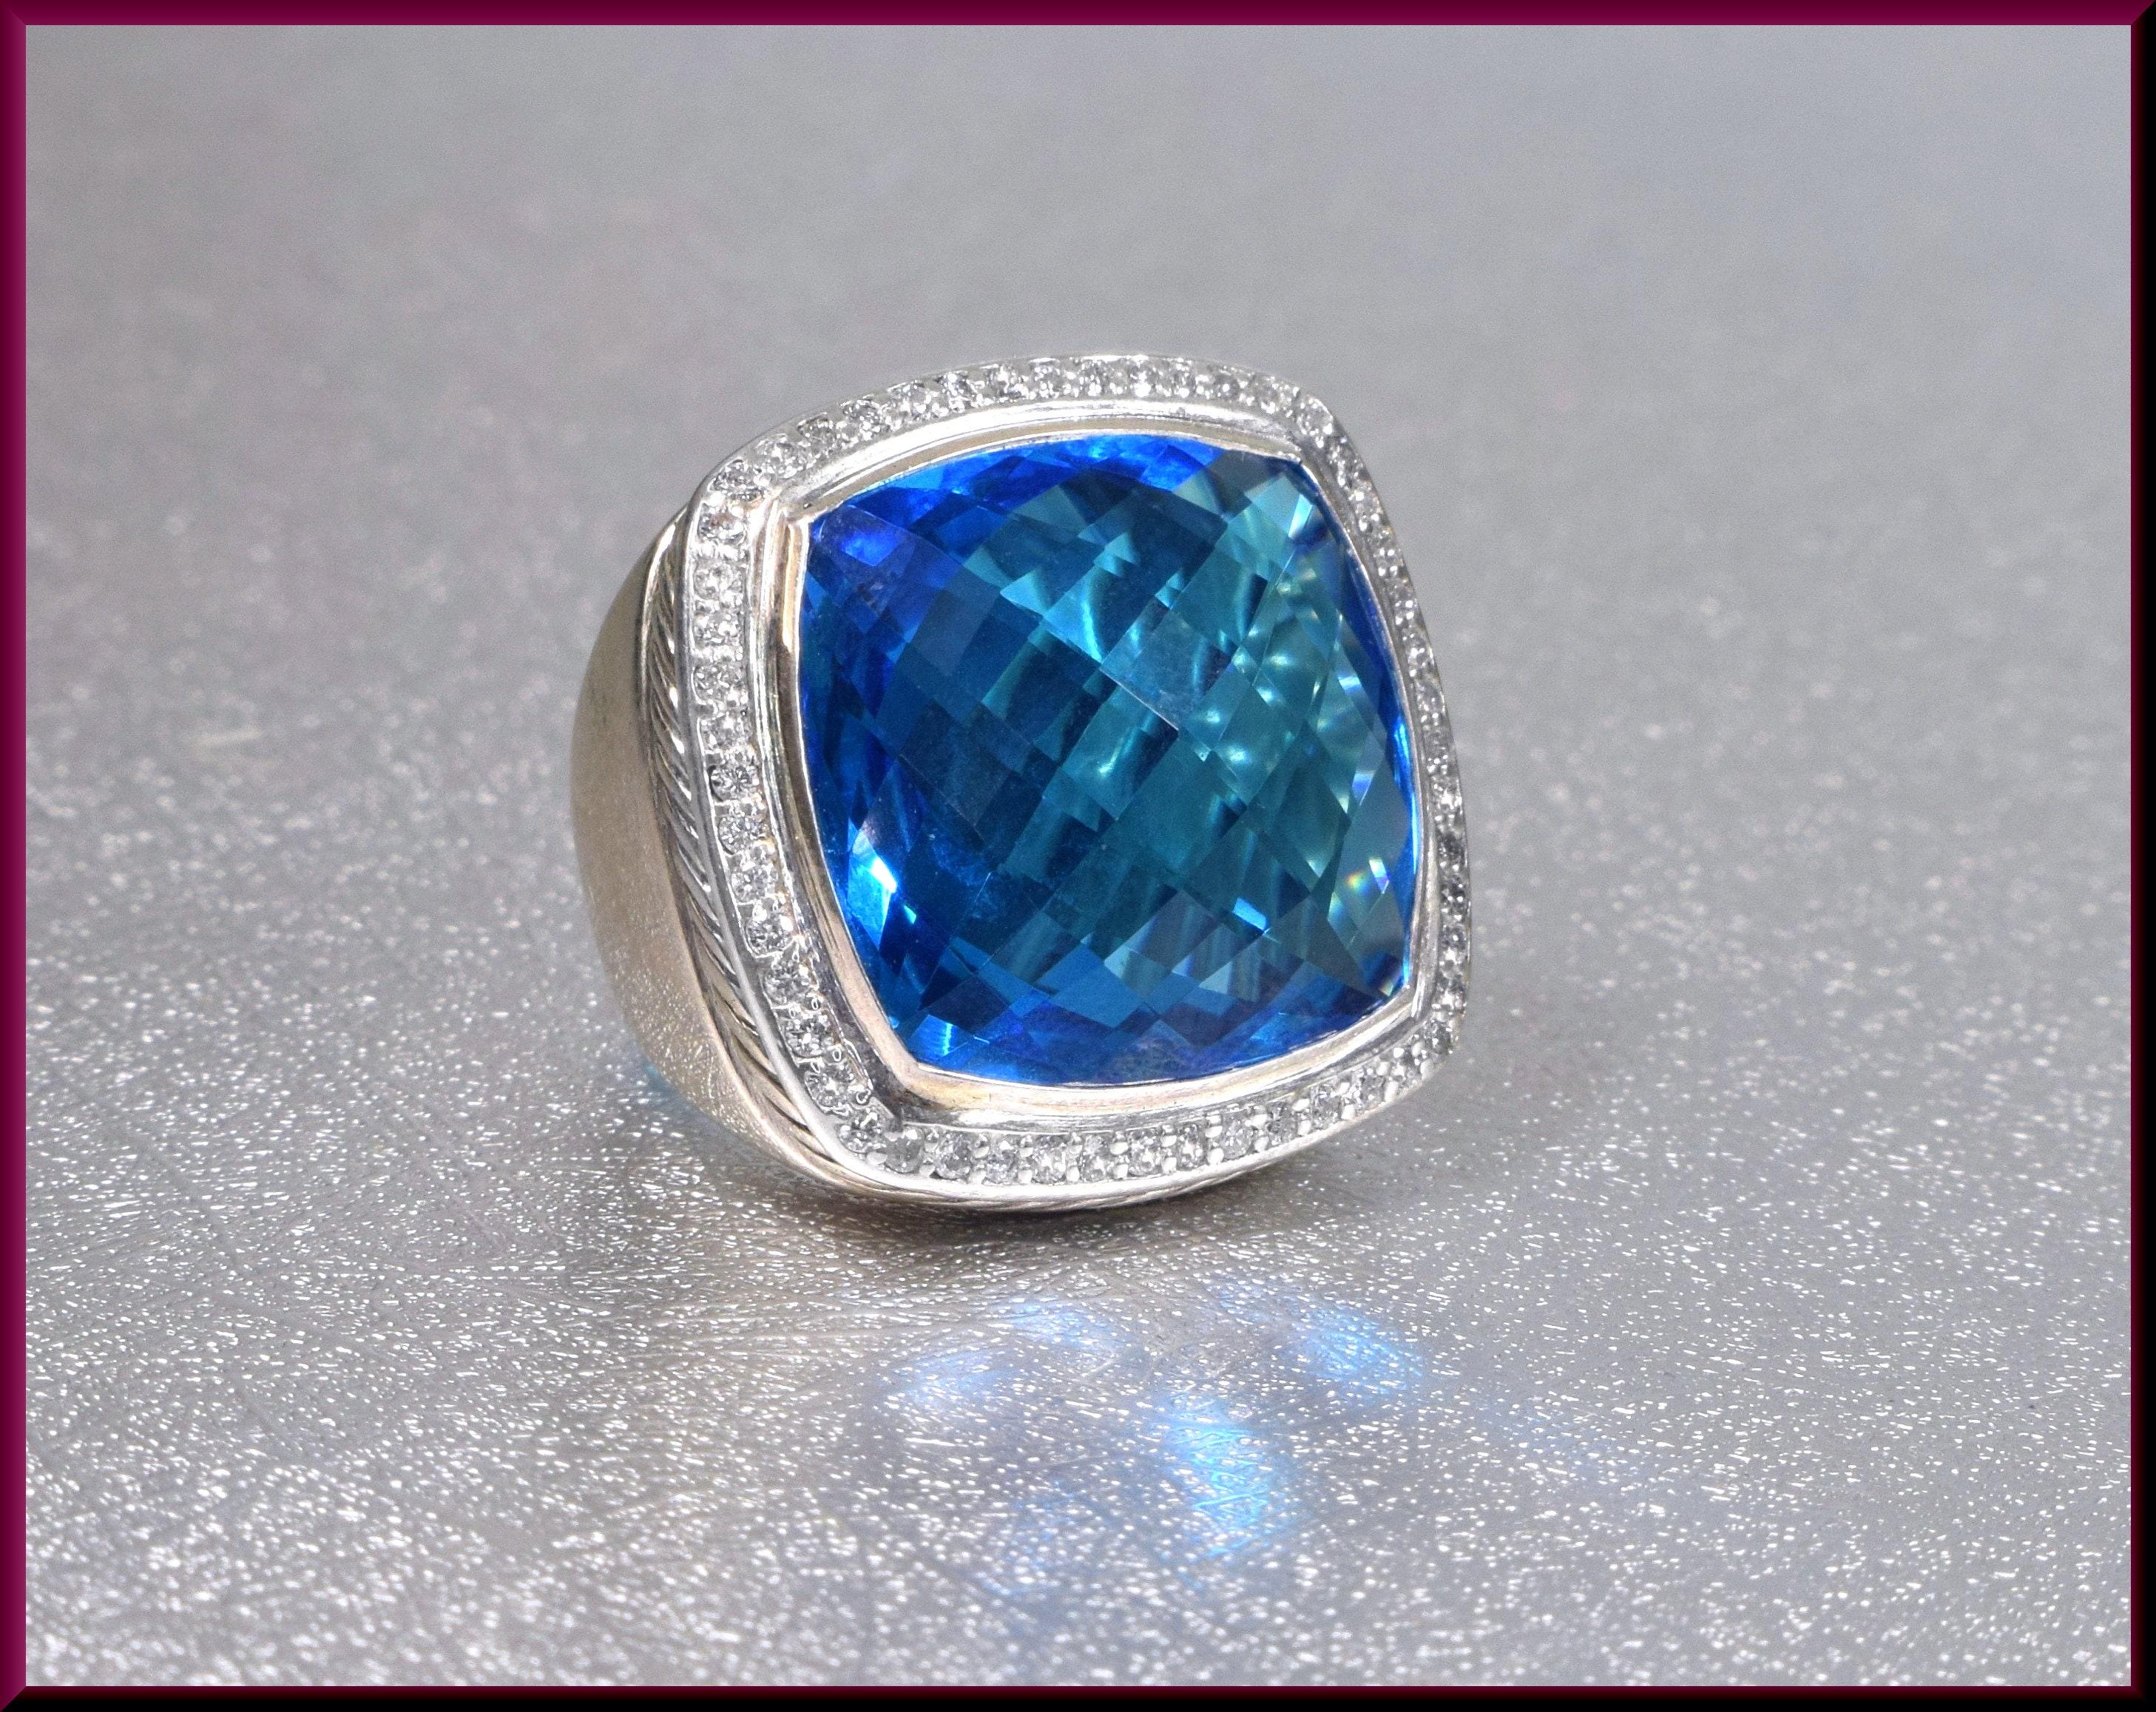 Petite albion blue topaz ring teens